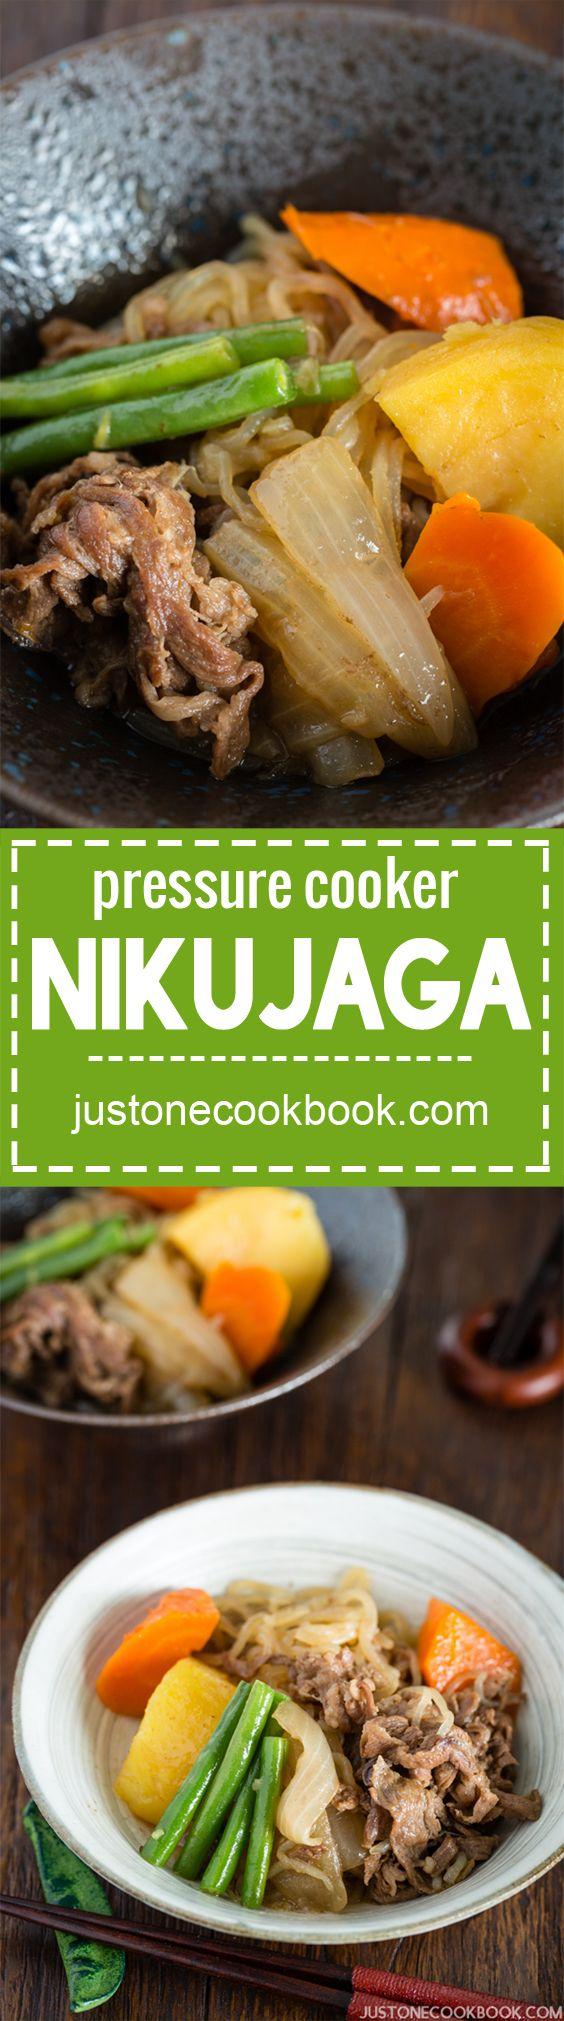 Pressure Cooker Nikujaga (肉じゃが) | Easy Japanese Recipes at JustOneCookbook.com